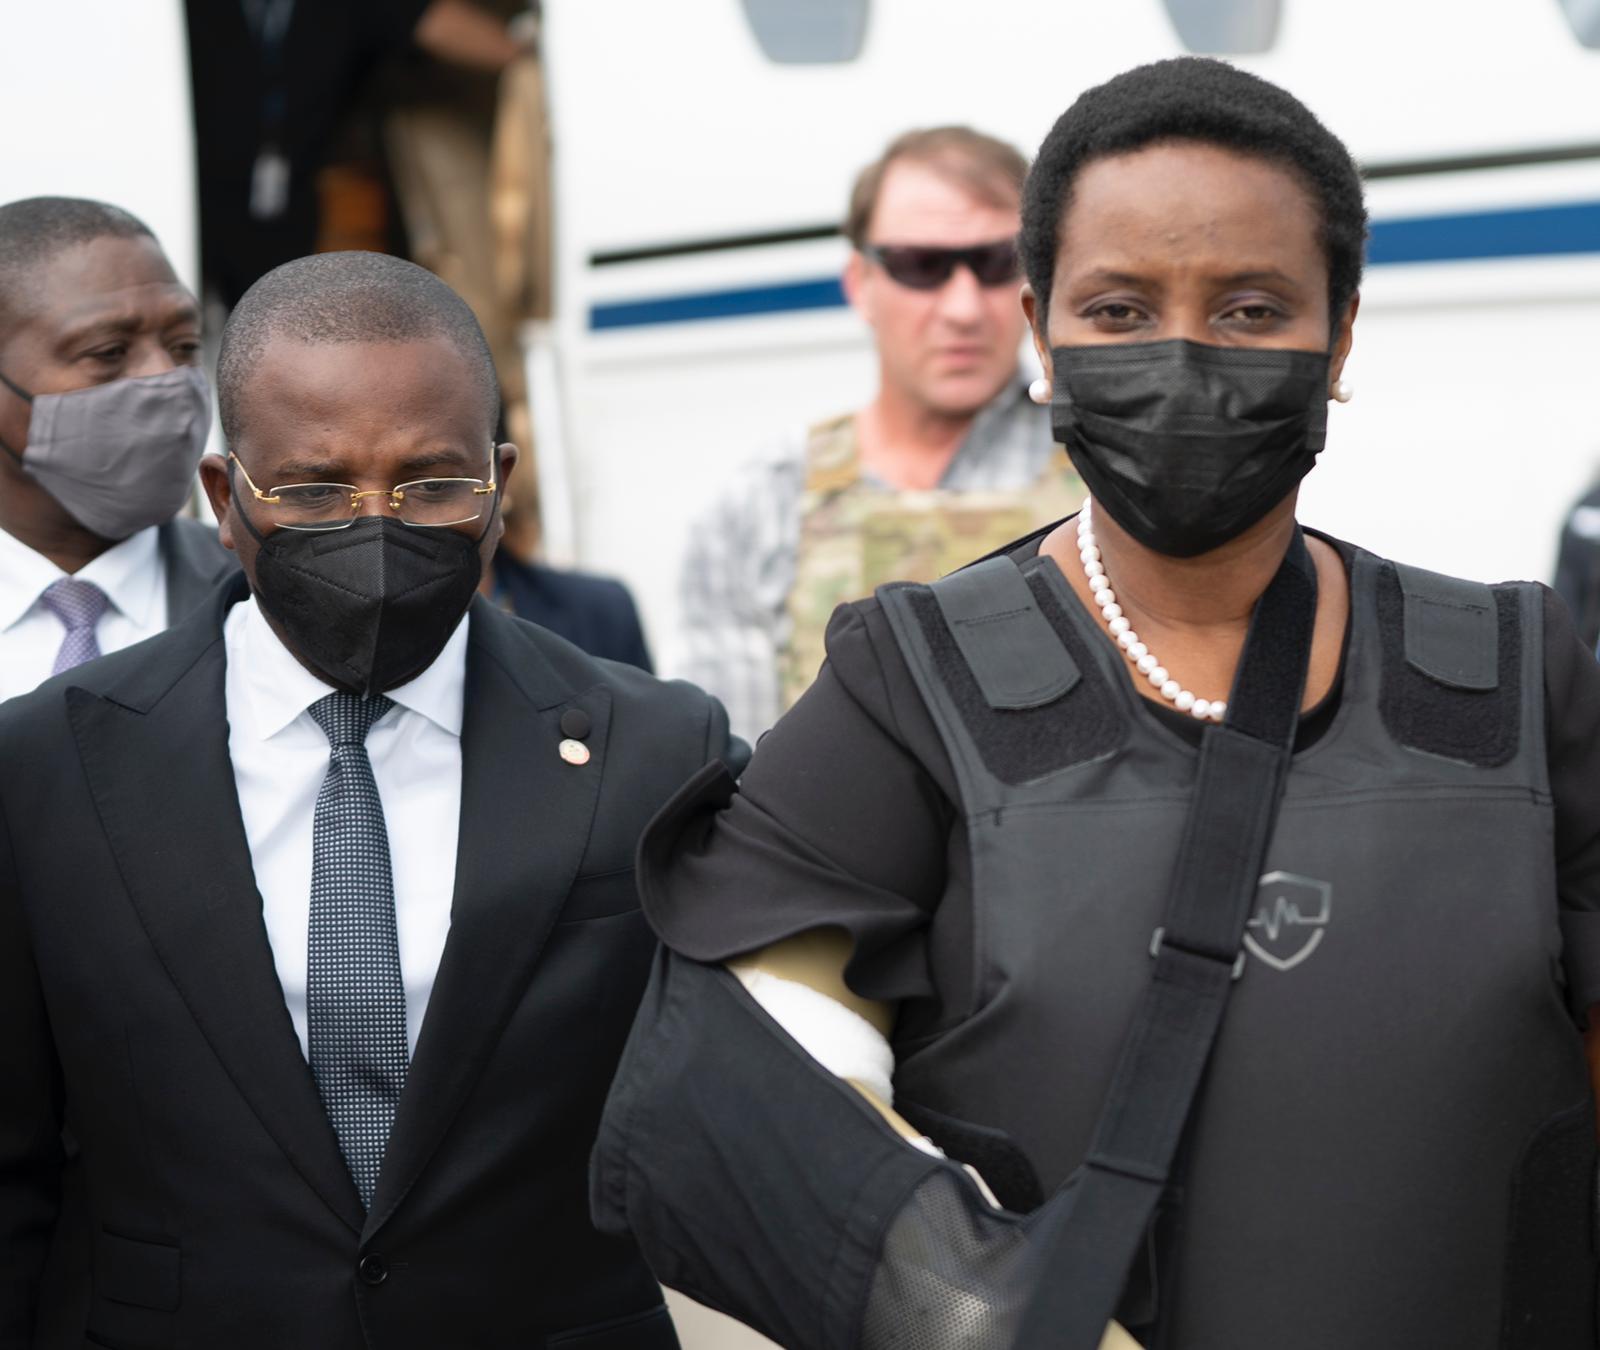 Martine Moise esposa del presidente asesinado en Haití regresó al país 2